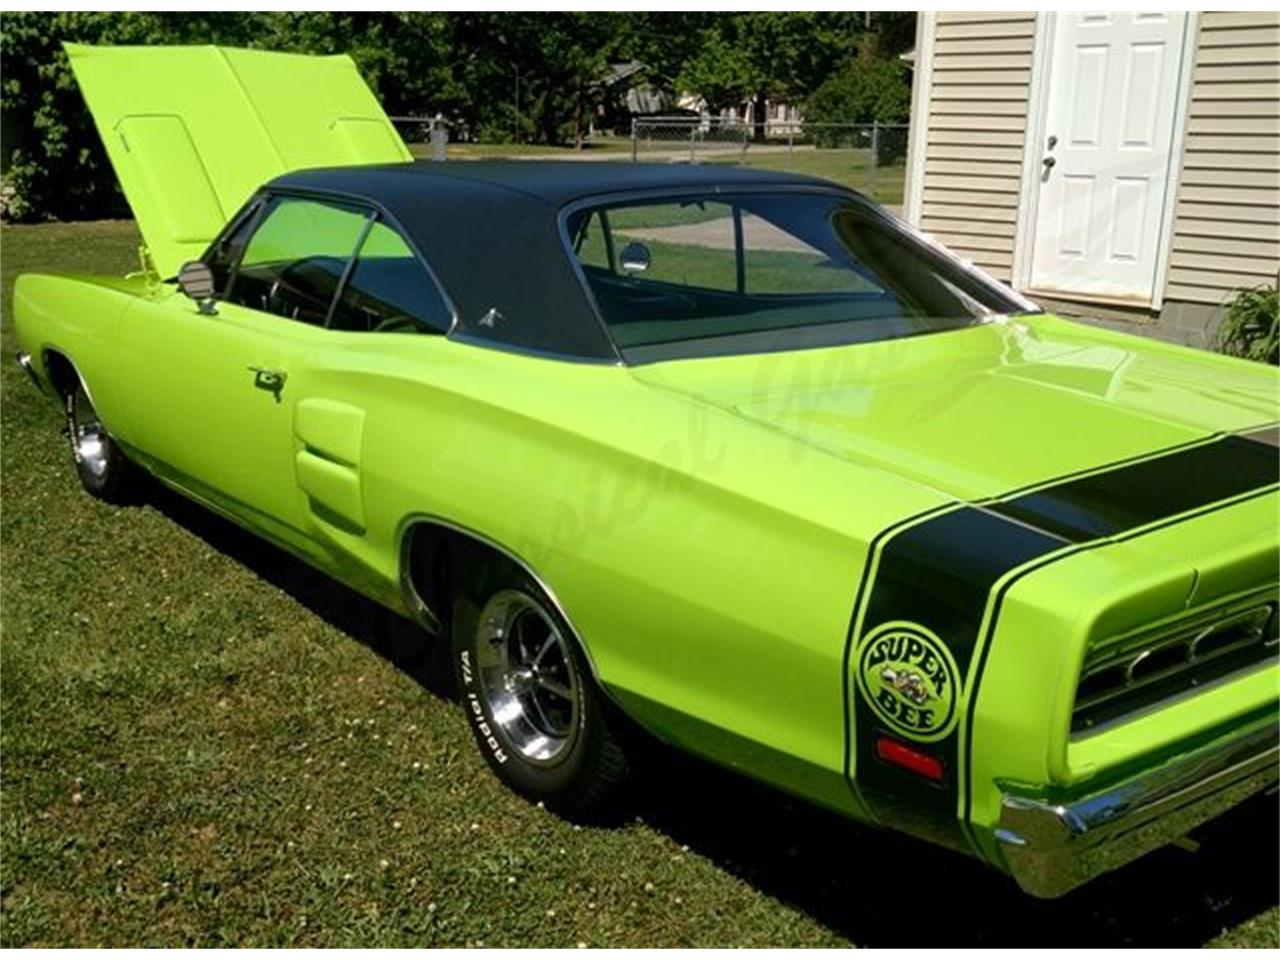 Texas Car Inspection >> 1969 Dodge Super Bee for Sale | ClassicCars.com | CC-876573